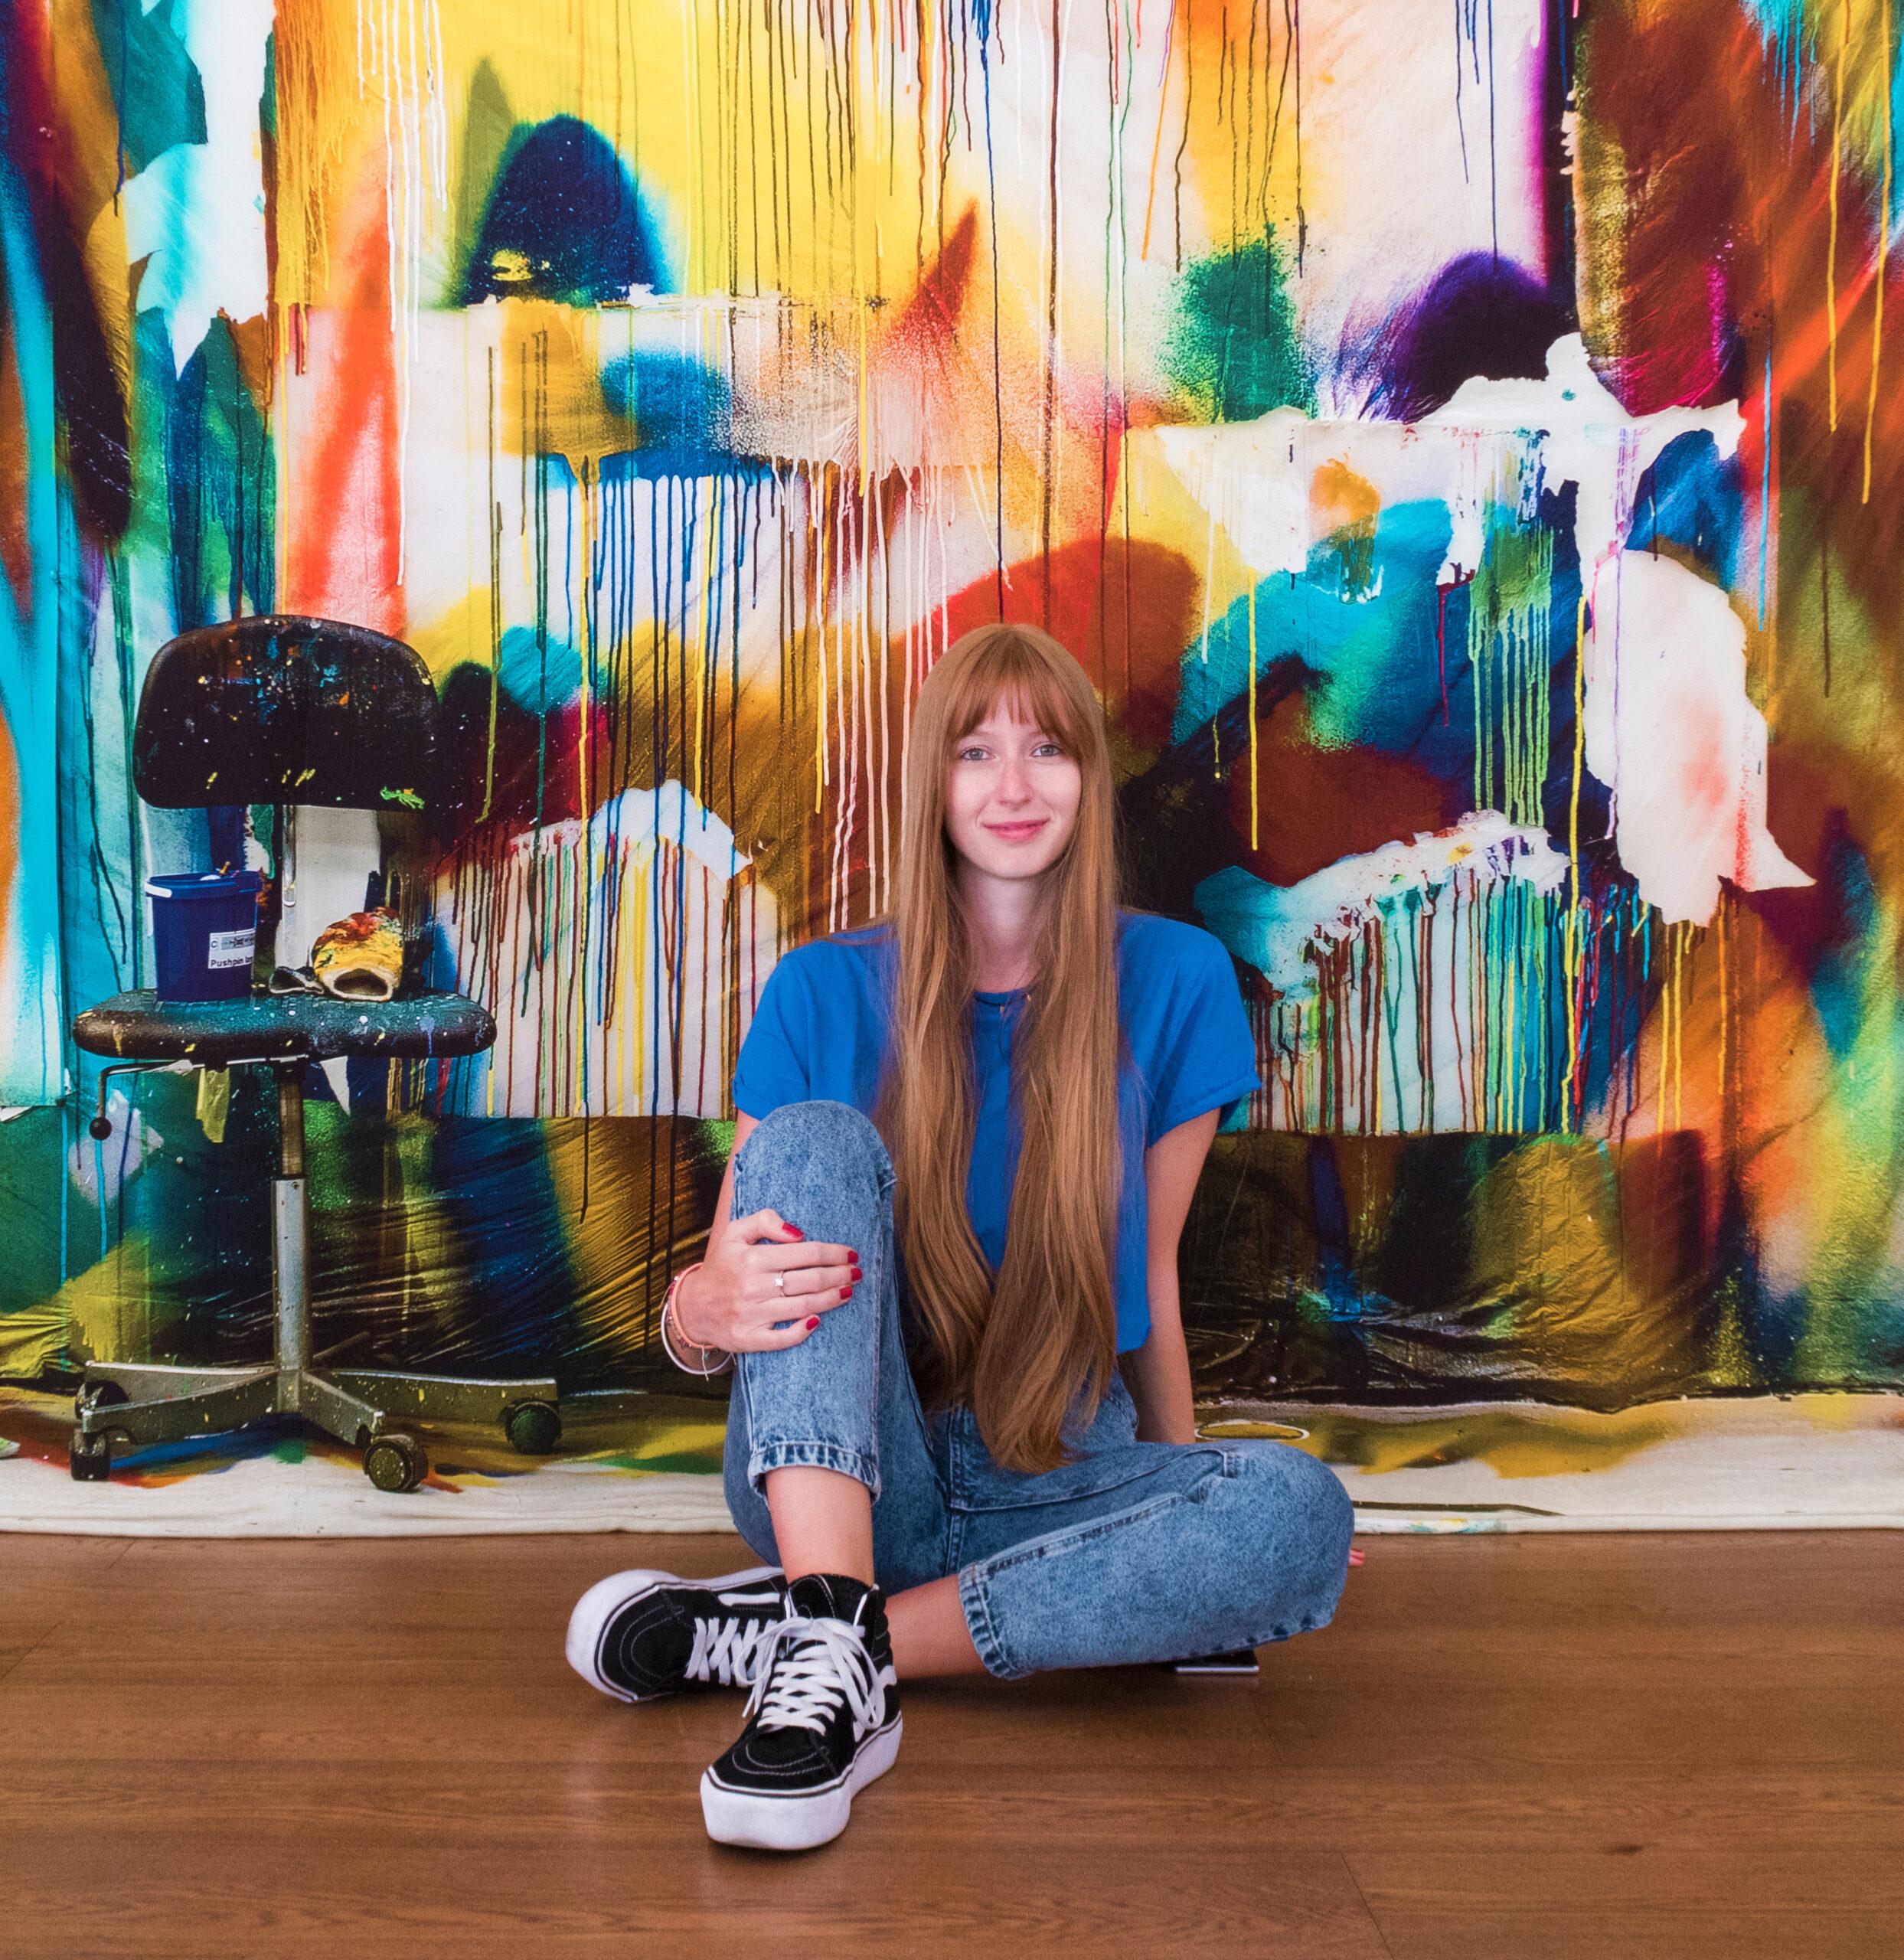 Cristina Ricci in front fo Katharina Grosse's artwork